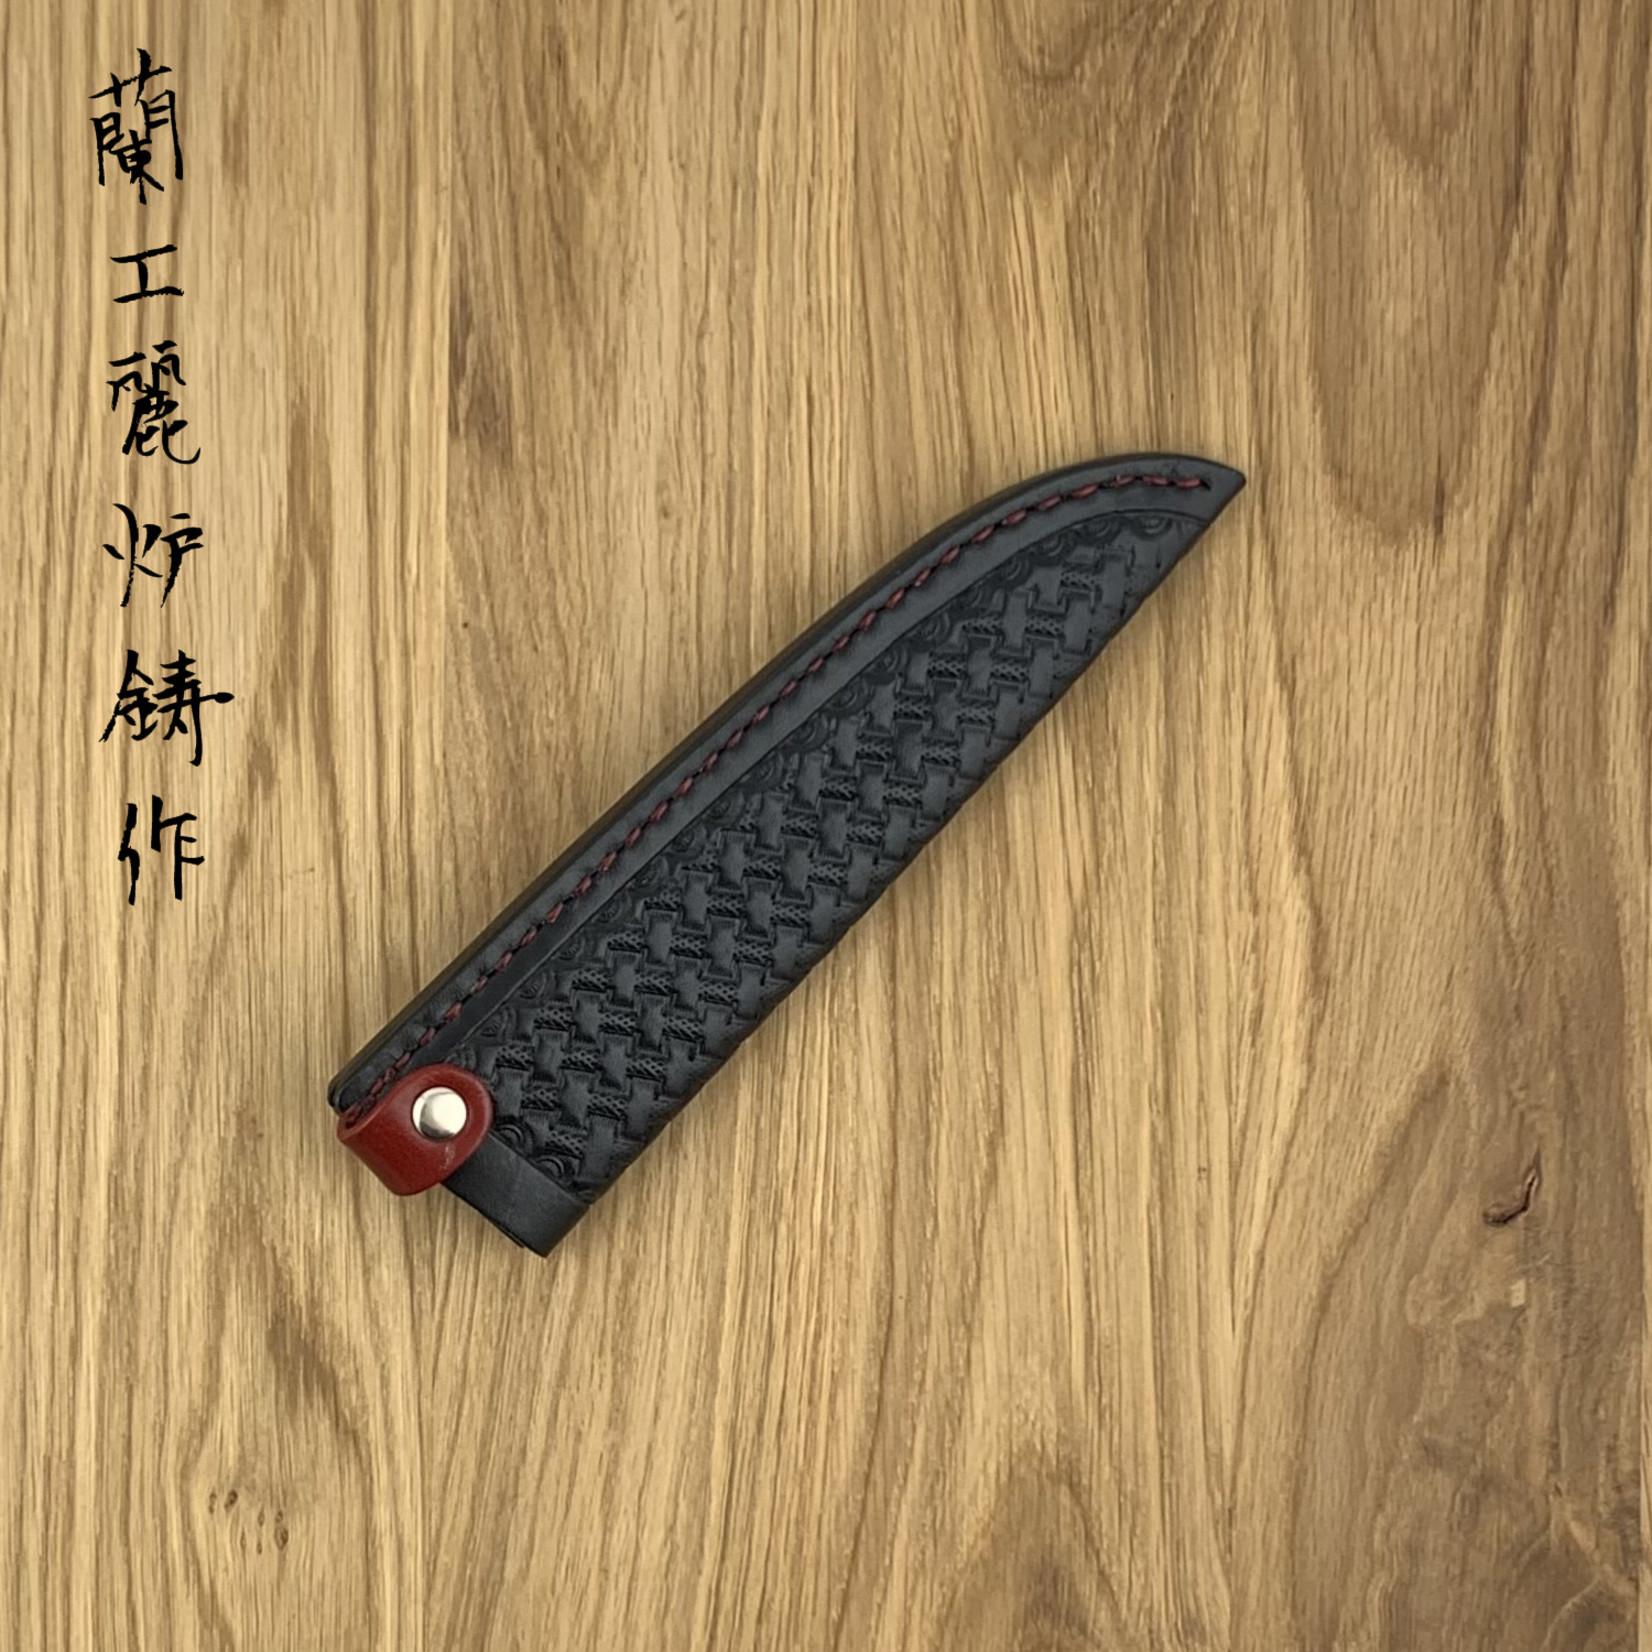 RYUSEN leather sheath LS-106 150mm petty Black